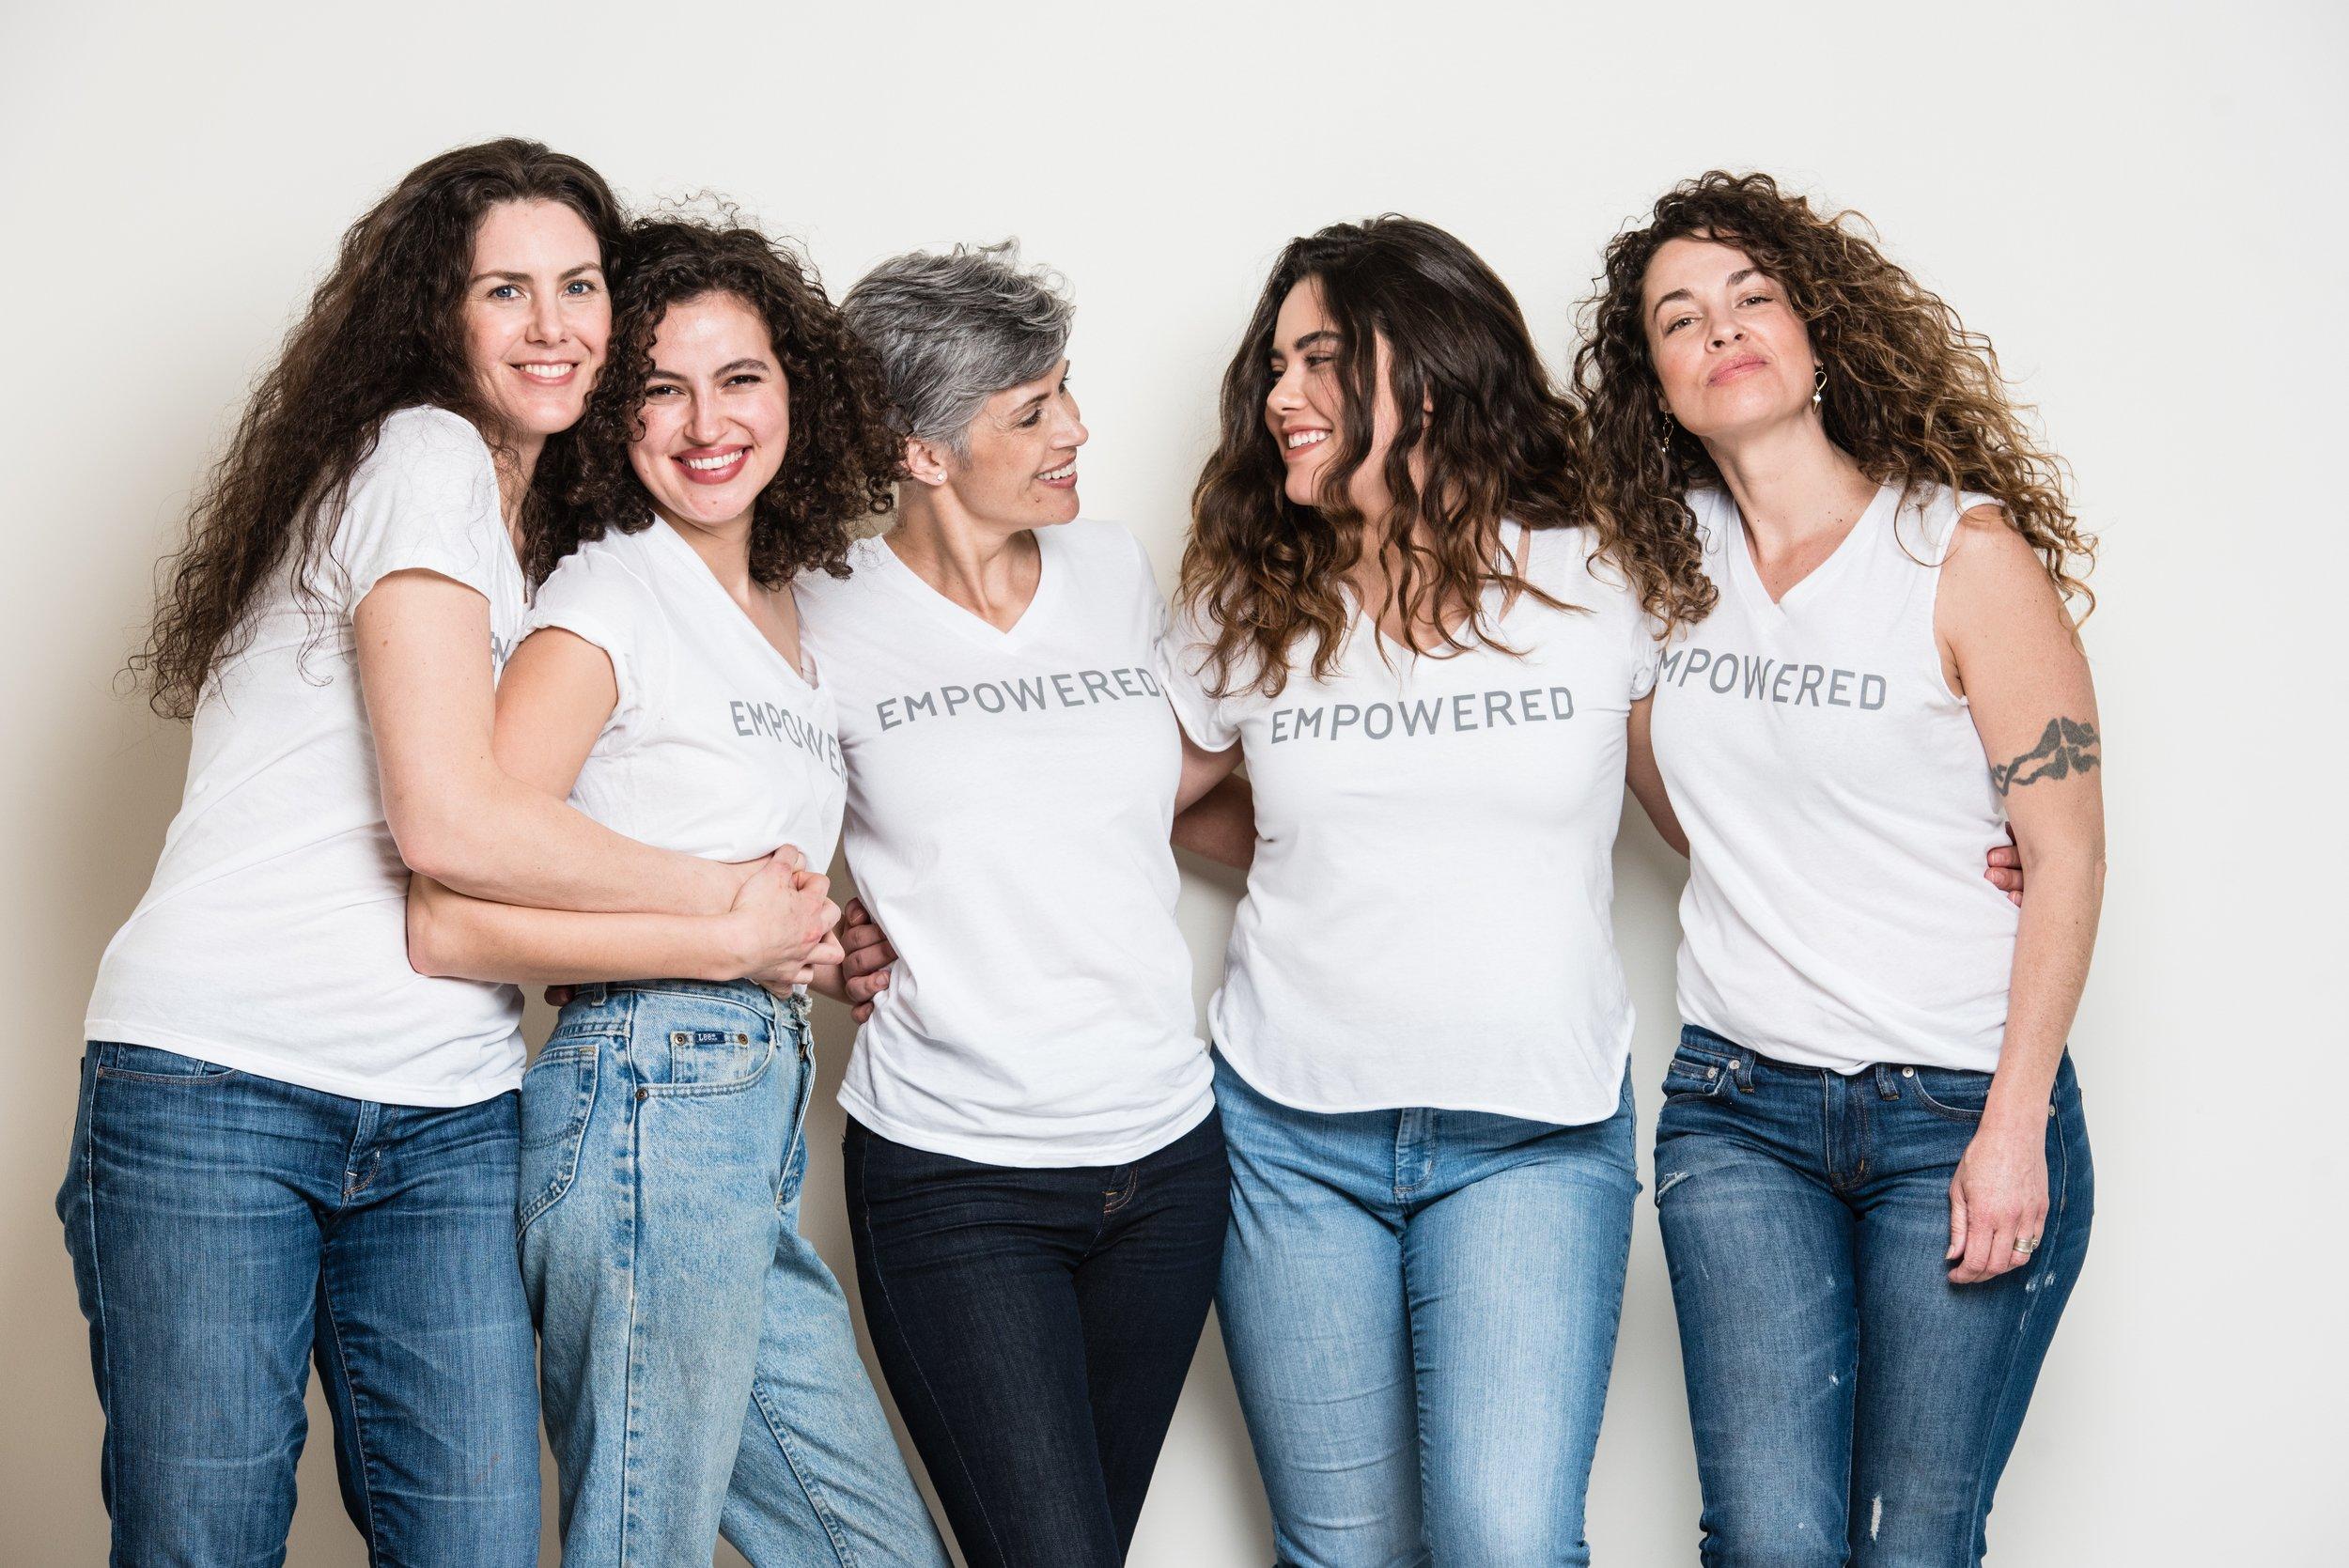 EmPowerEd Group Hug Signa Solana.jpg